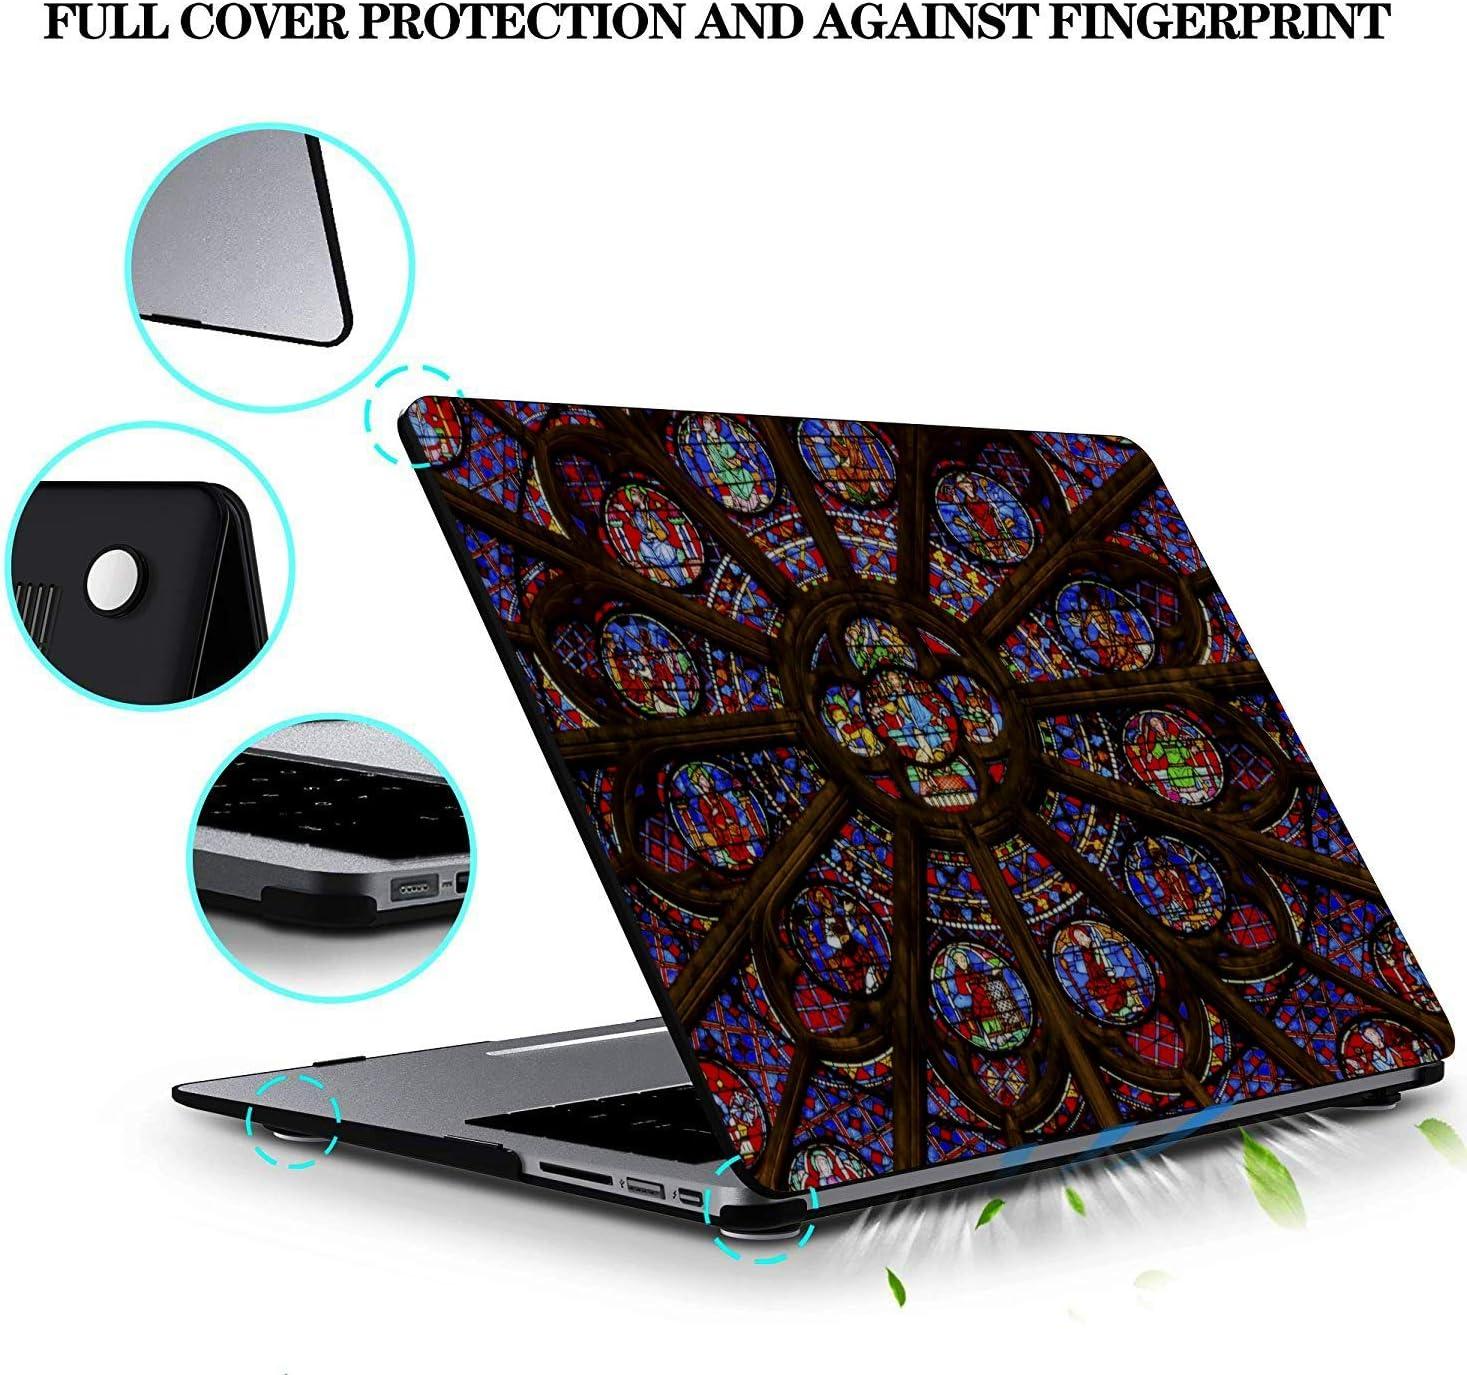 MacBook Accessories 13 Inch Rose Window Notre Dame De Paris Plastic Hard Shell Compatible Mac Air 11 Pro 13 15 Laptop Cover Case Protection for MacBook 2016-2019 Version